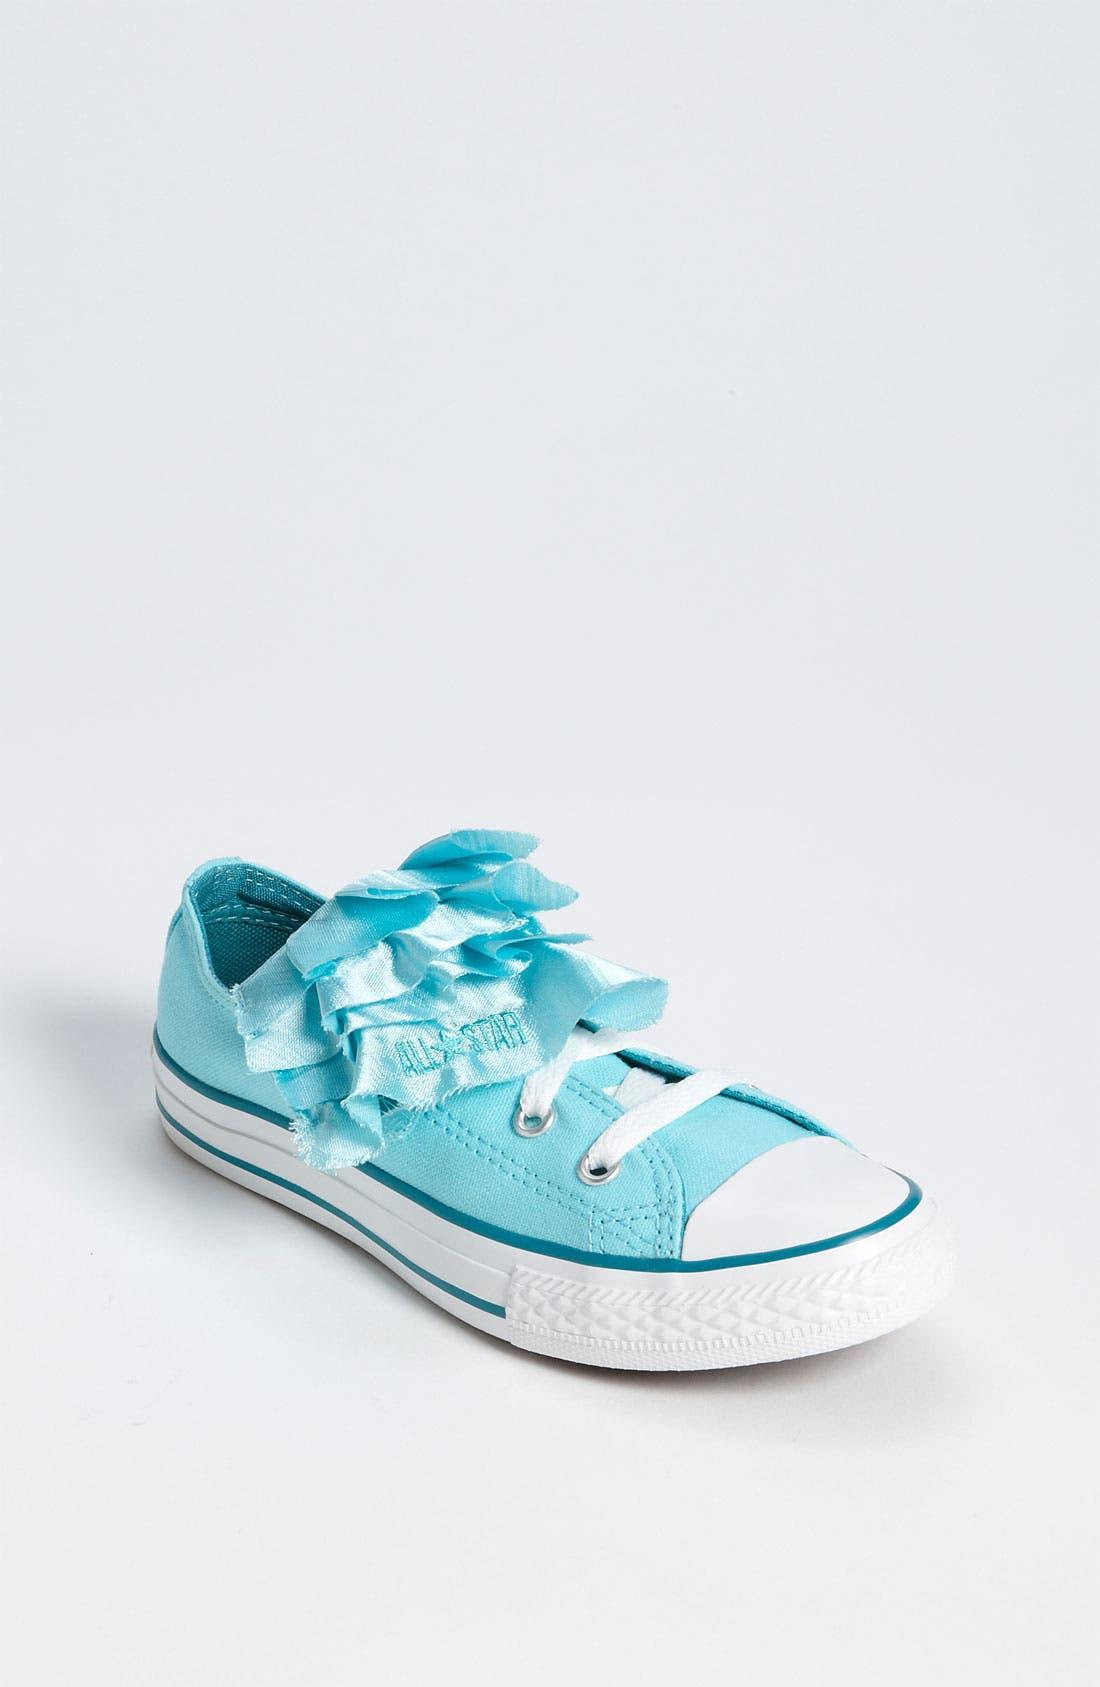 Main Image - Converse Chuck Taylor® All Star® 'Mega Tongue' Sneaker (Toddler, Little Kid & Big Kid)